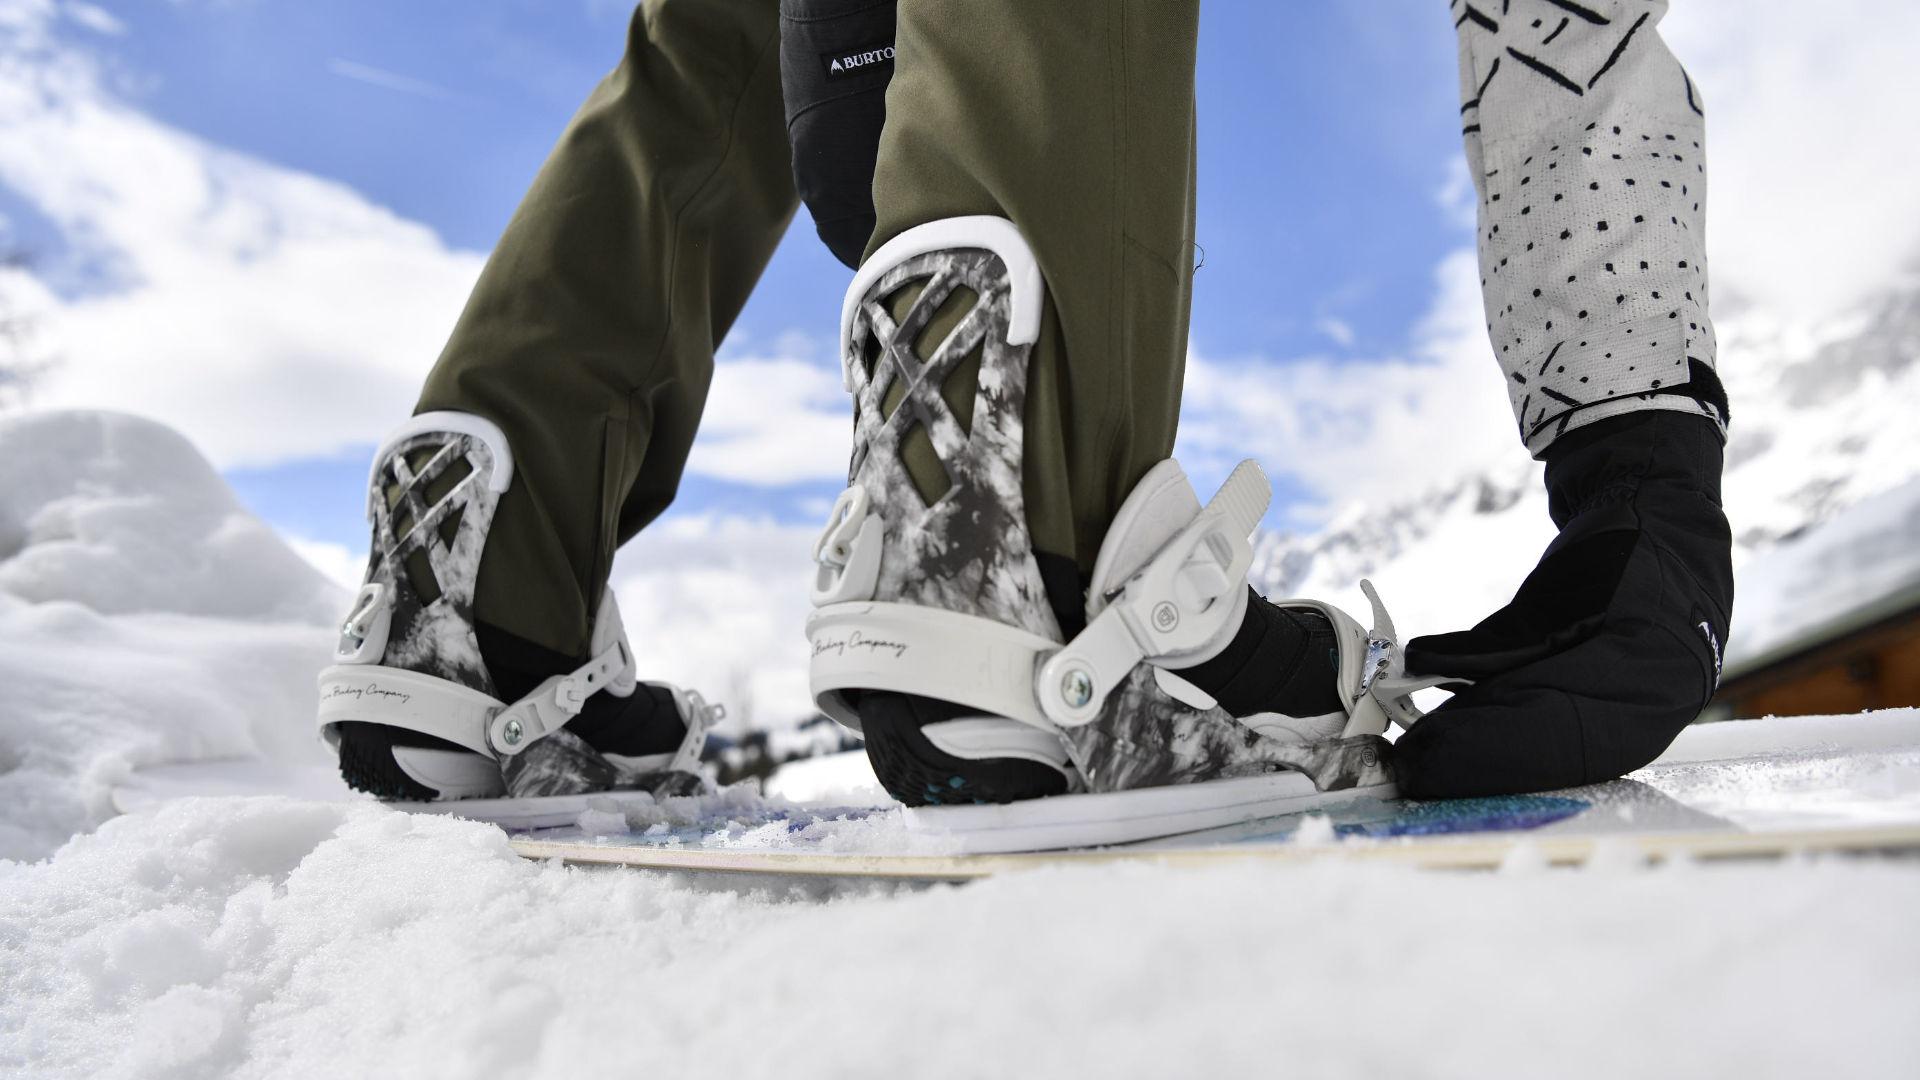 K2 Snowboard Bindung MERIDIAN 2019 silver Winter Snowboardbindung Schnee Neu Skisport & Snowboarding